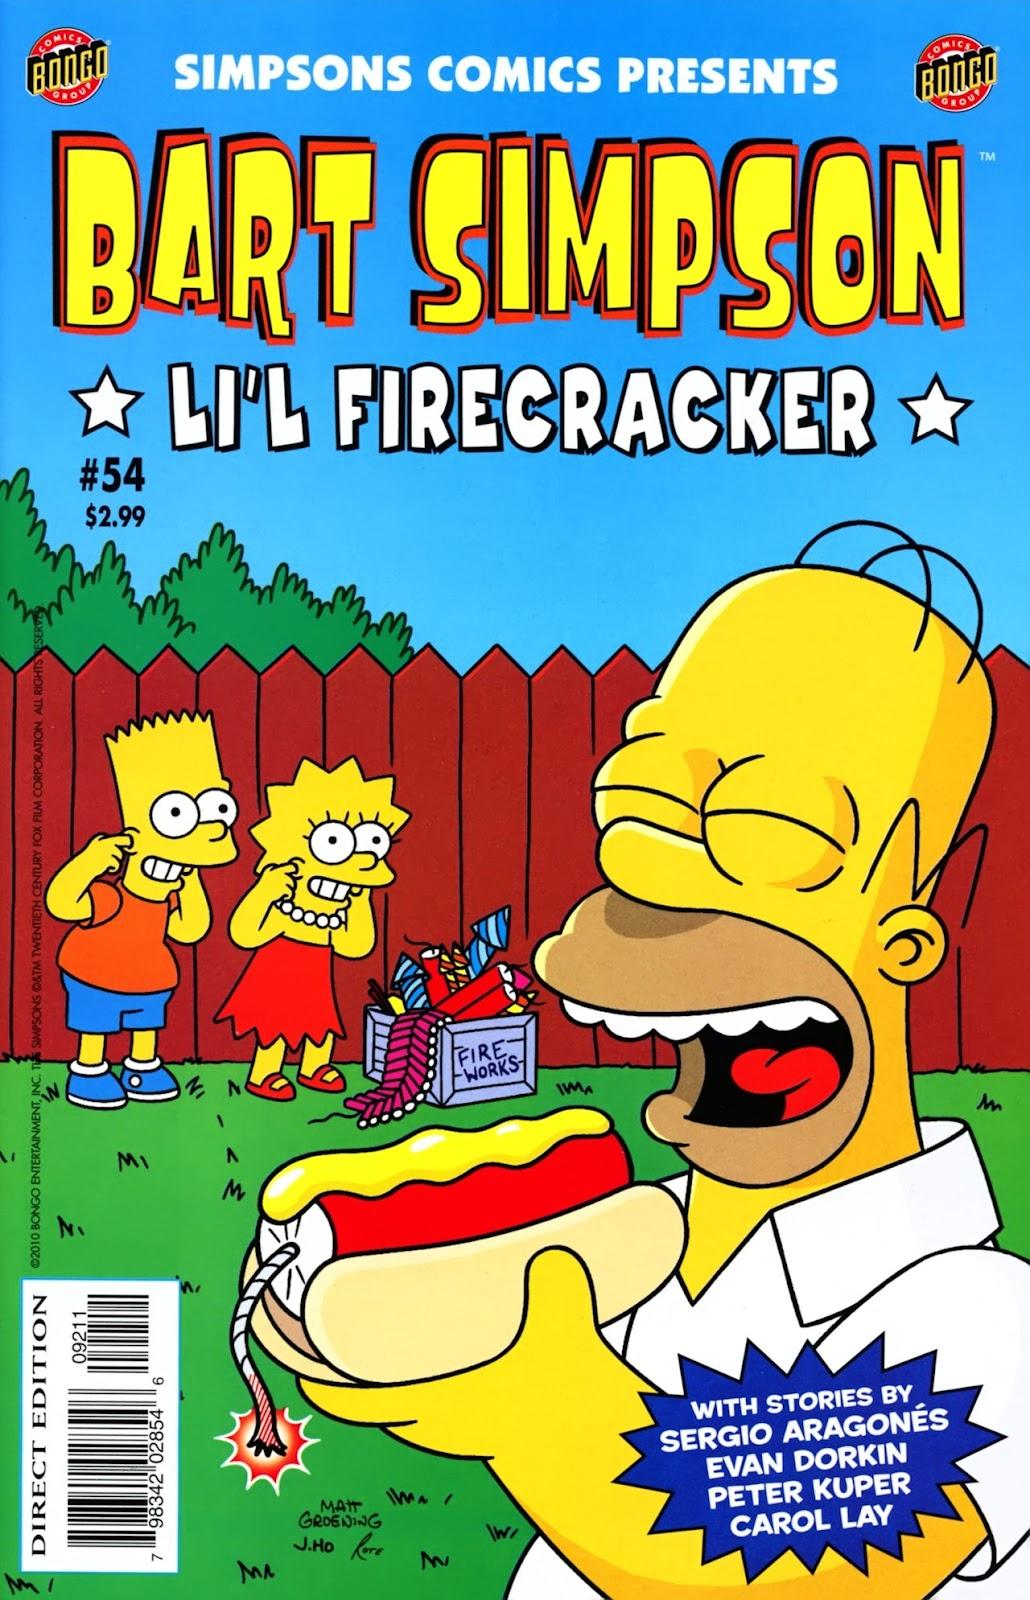 Simpsons Comics Presents Bart Simpson 54 Page 1